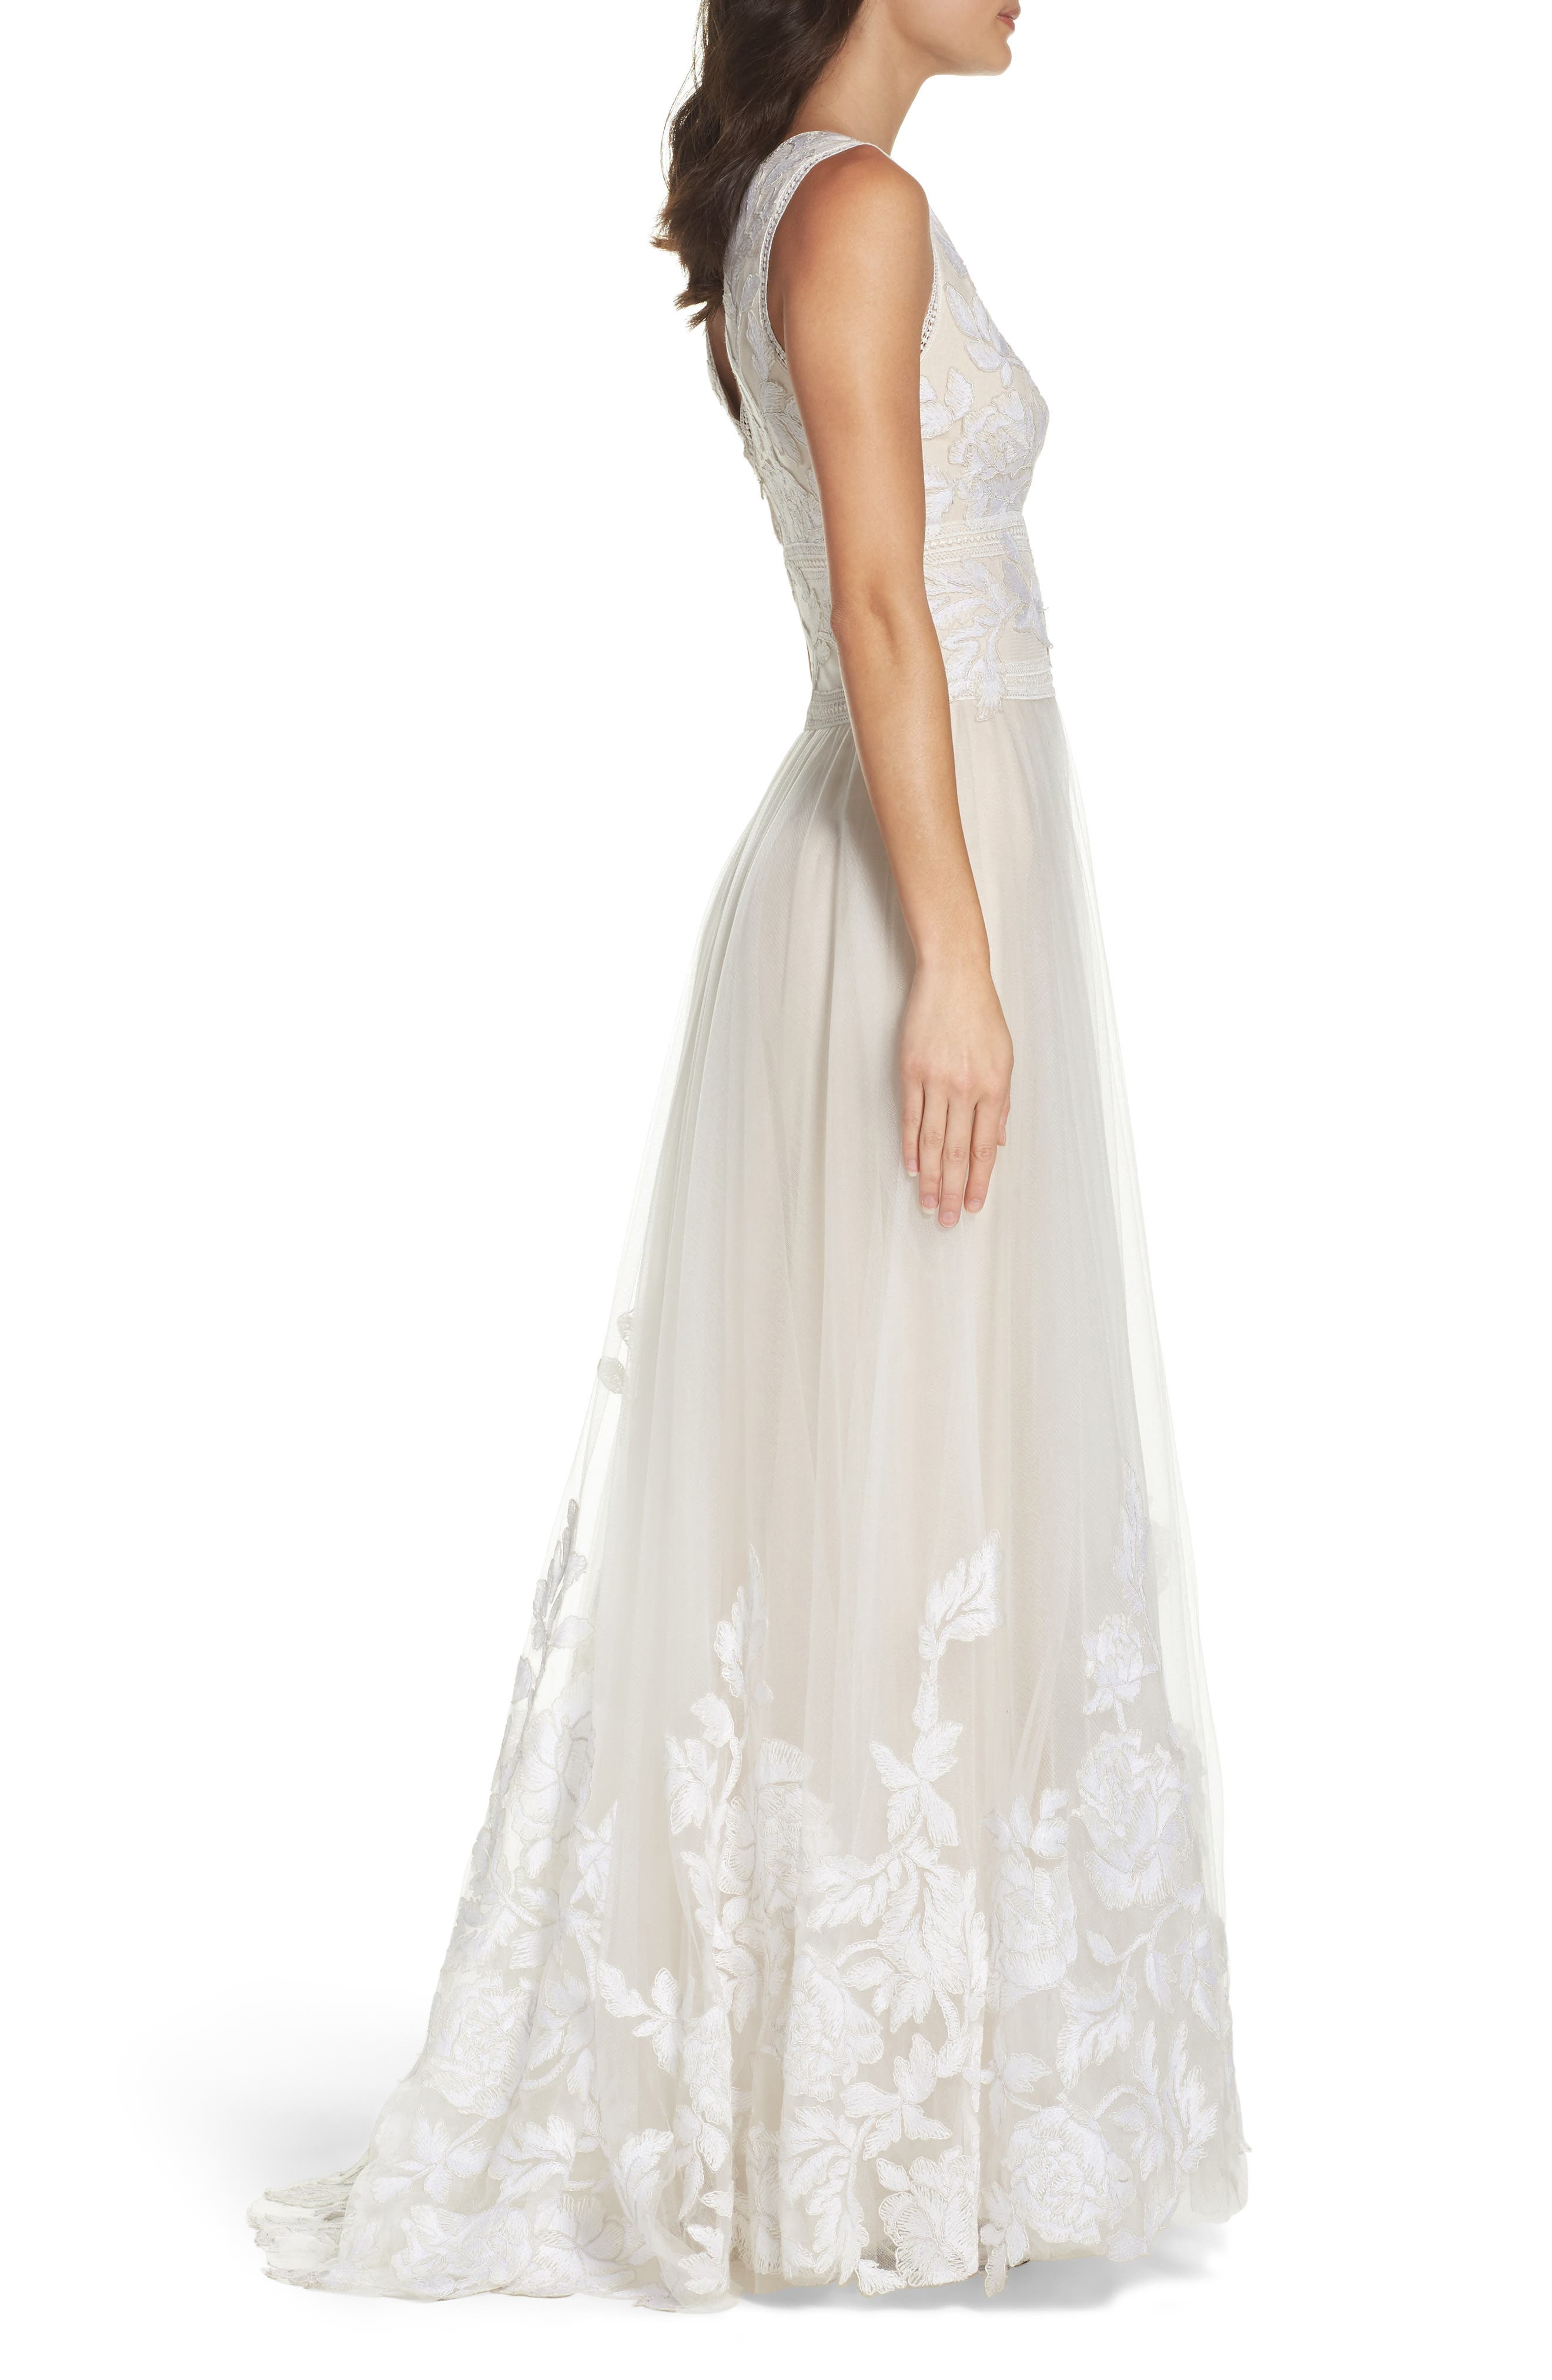 Tulle Lace A-Line Gown,                             Alternate thumbnail 3, color,                             IVORY/ PETAL